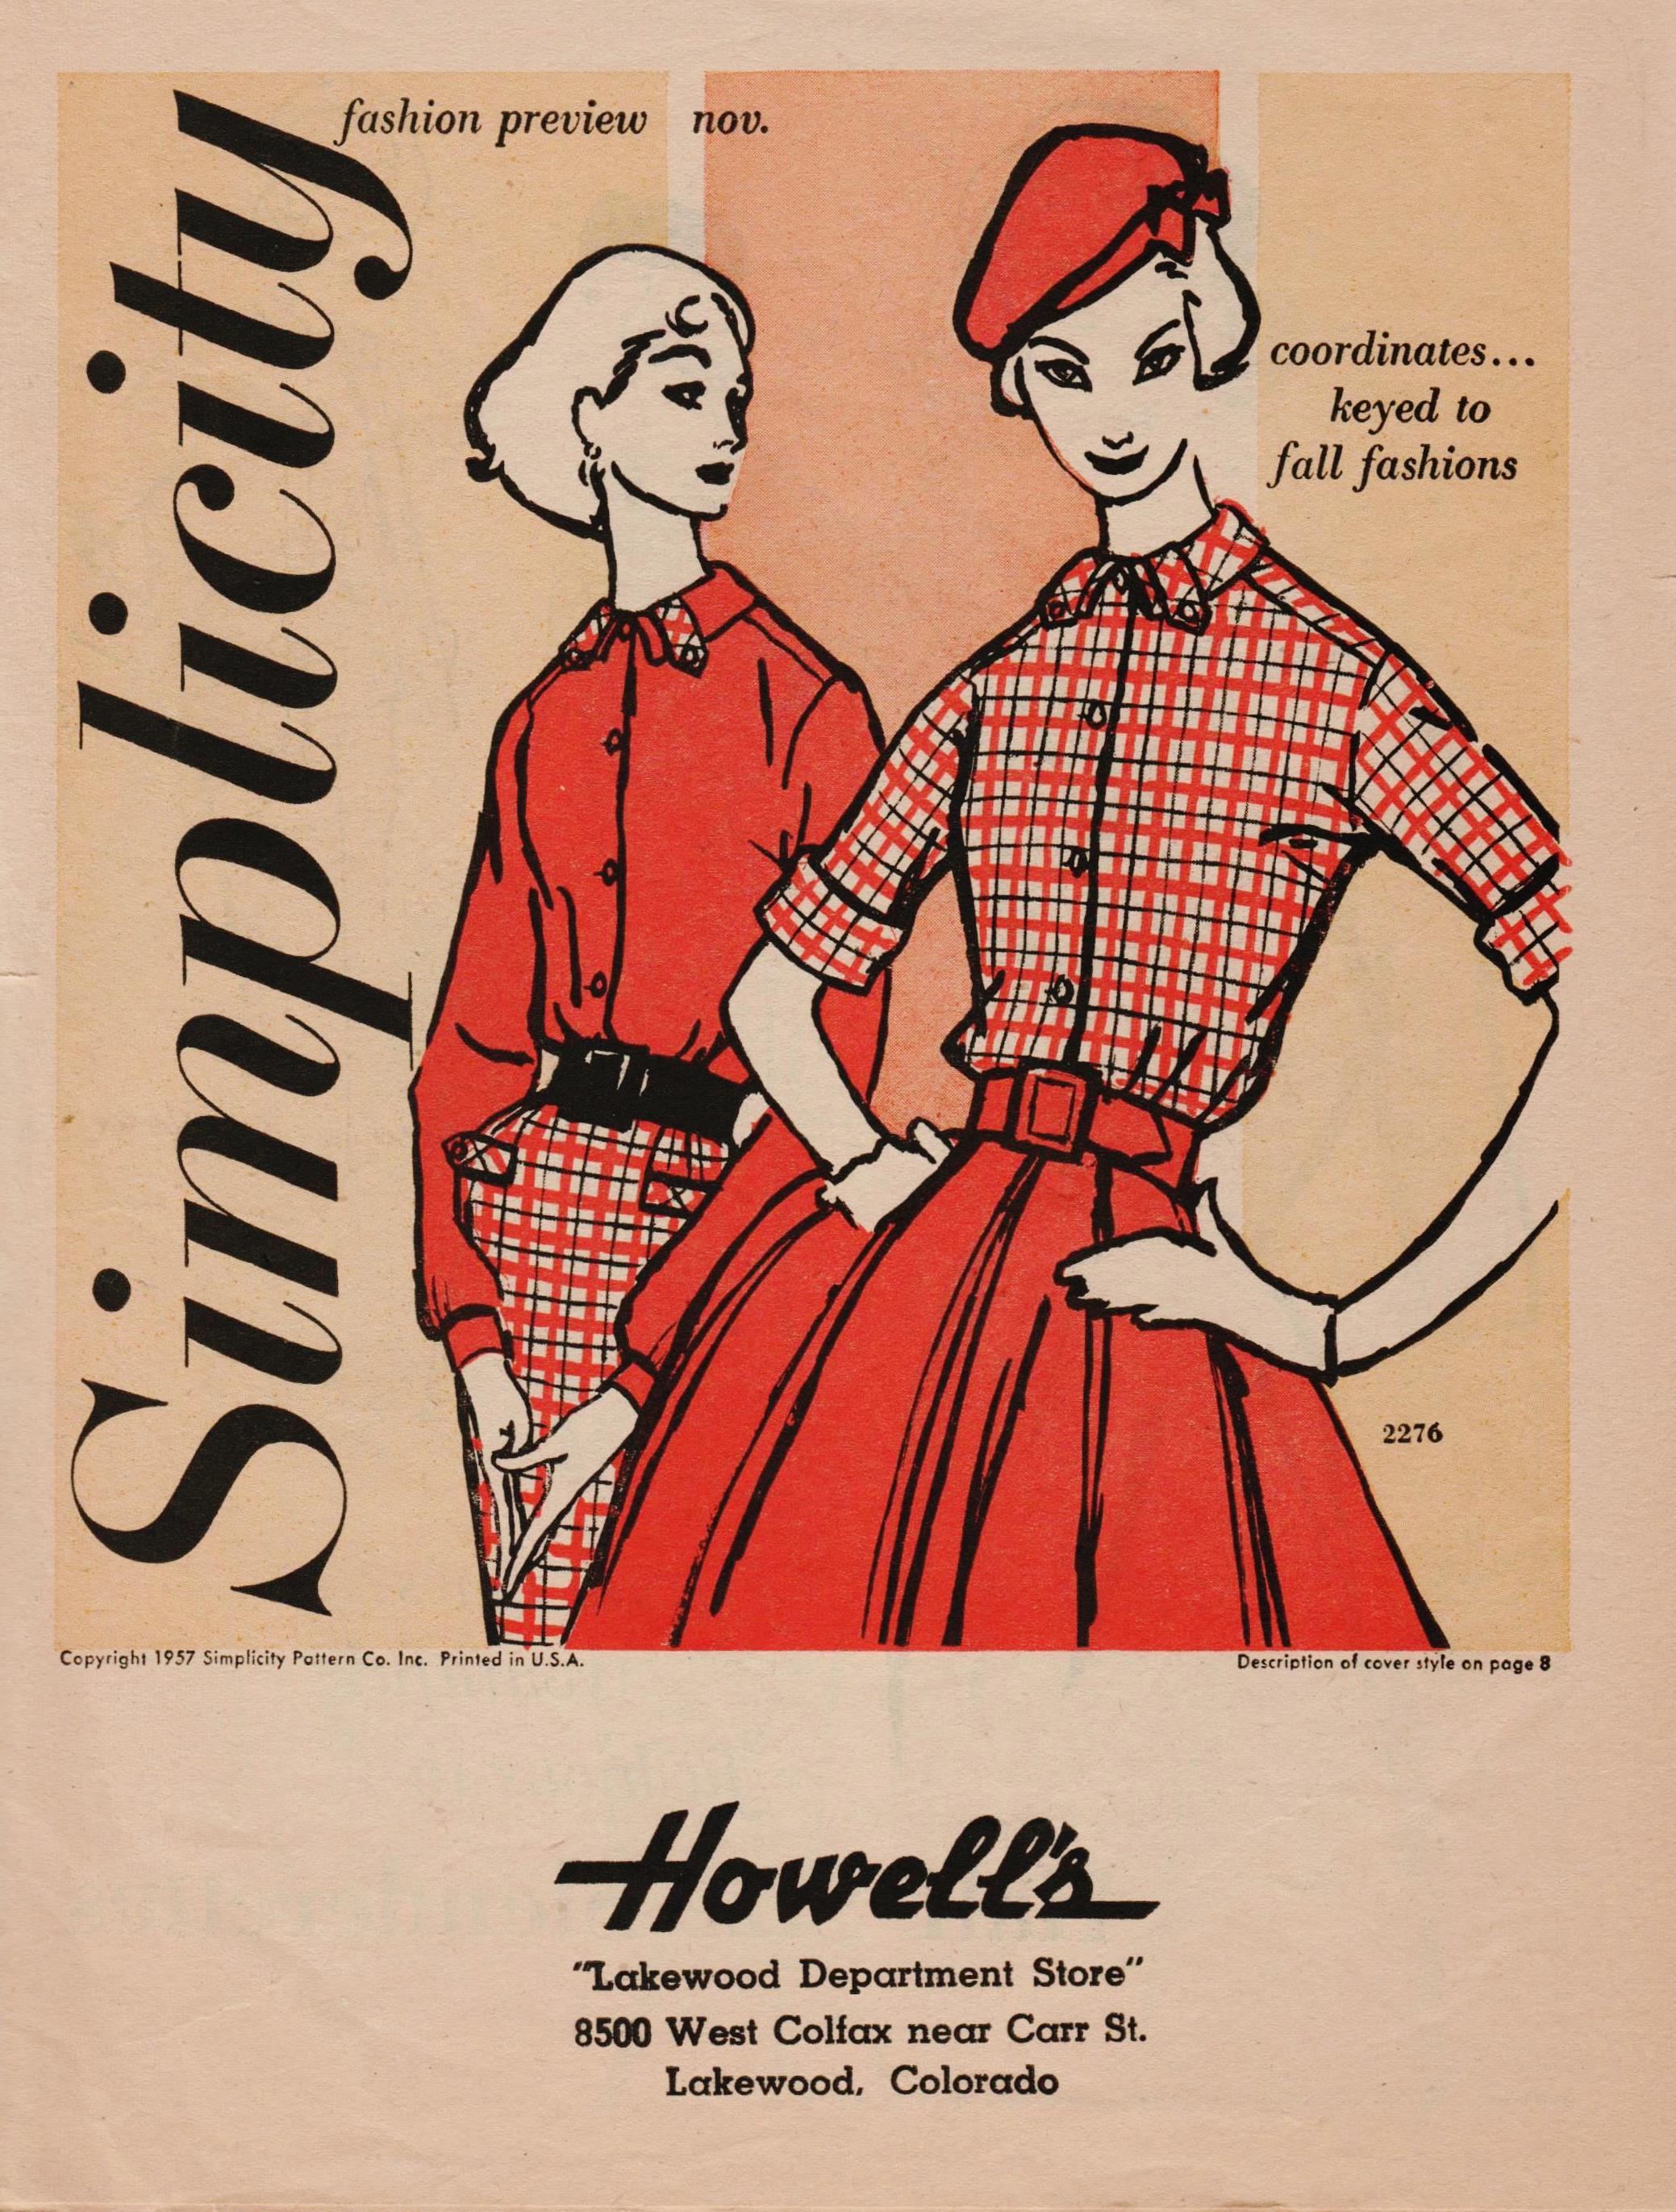 Simplicity Fashion Preview November 1957